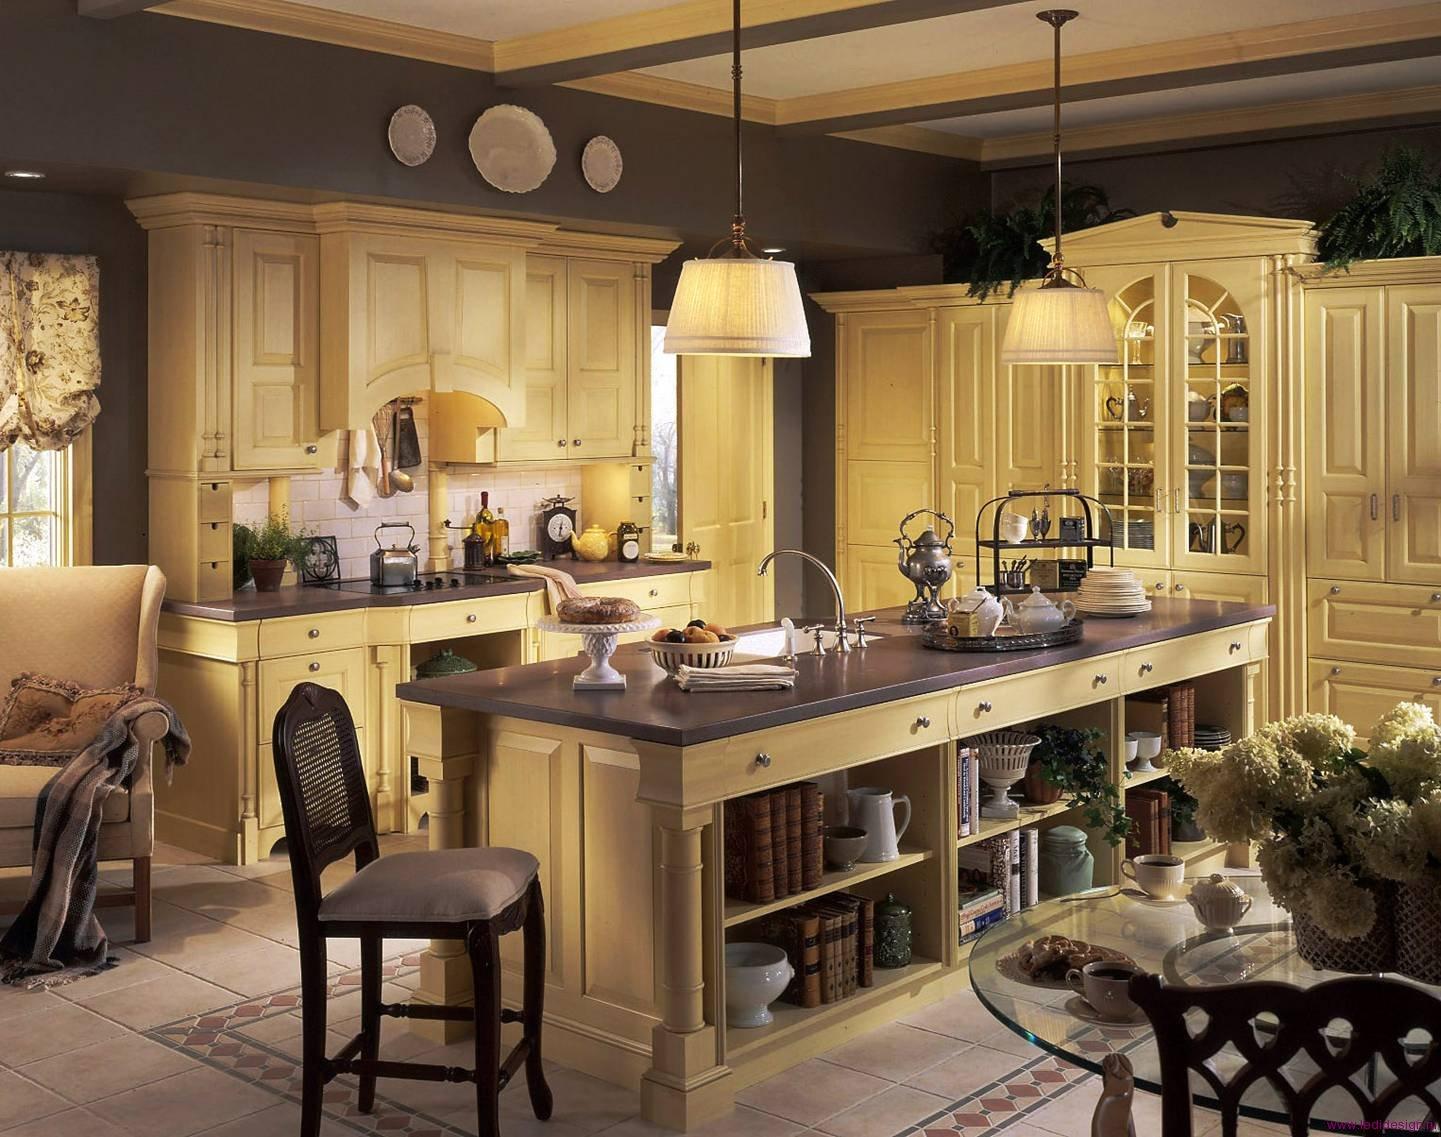 Кухня с островом в стиле кантри